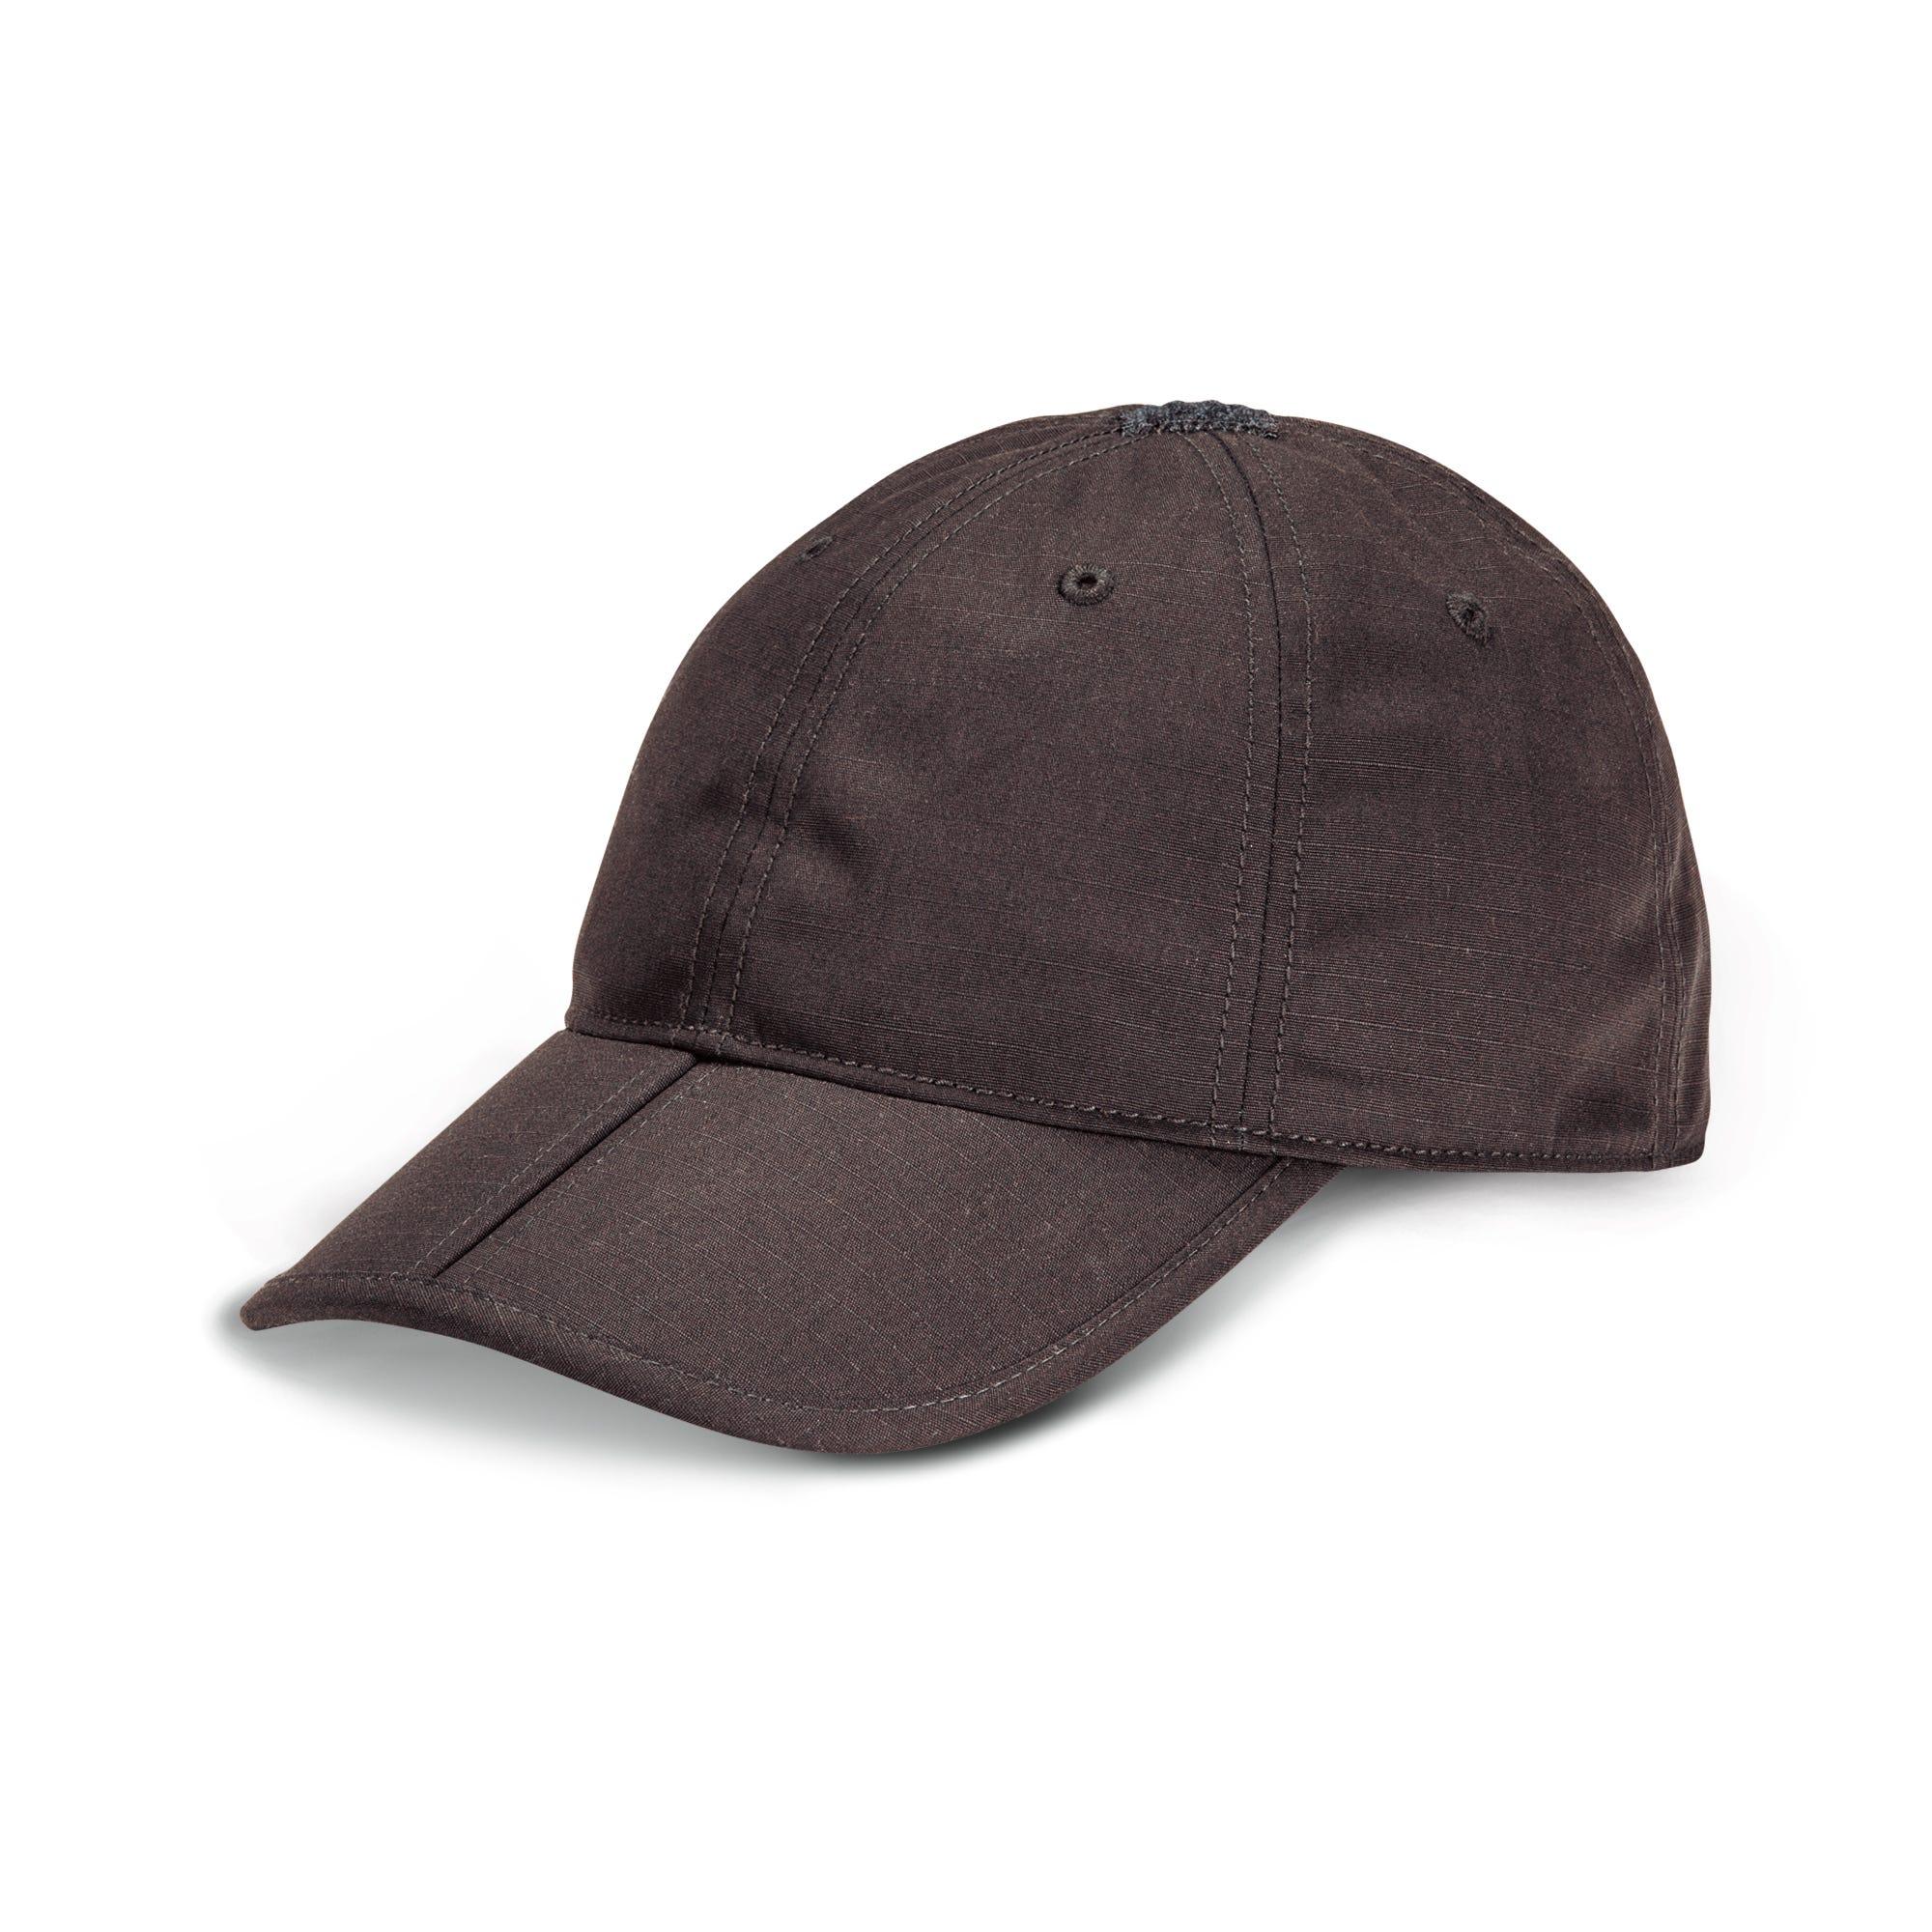 7b94d8916a262 Foldable Uniform Hat - 5.11 Tactical